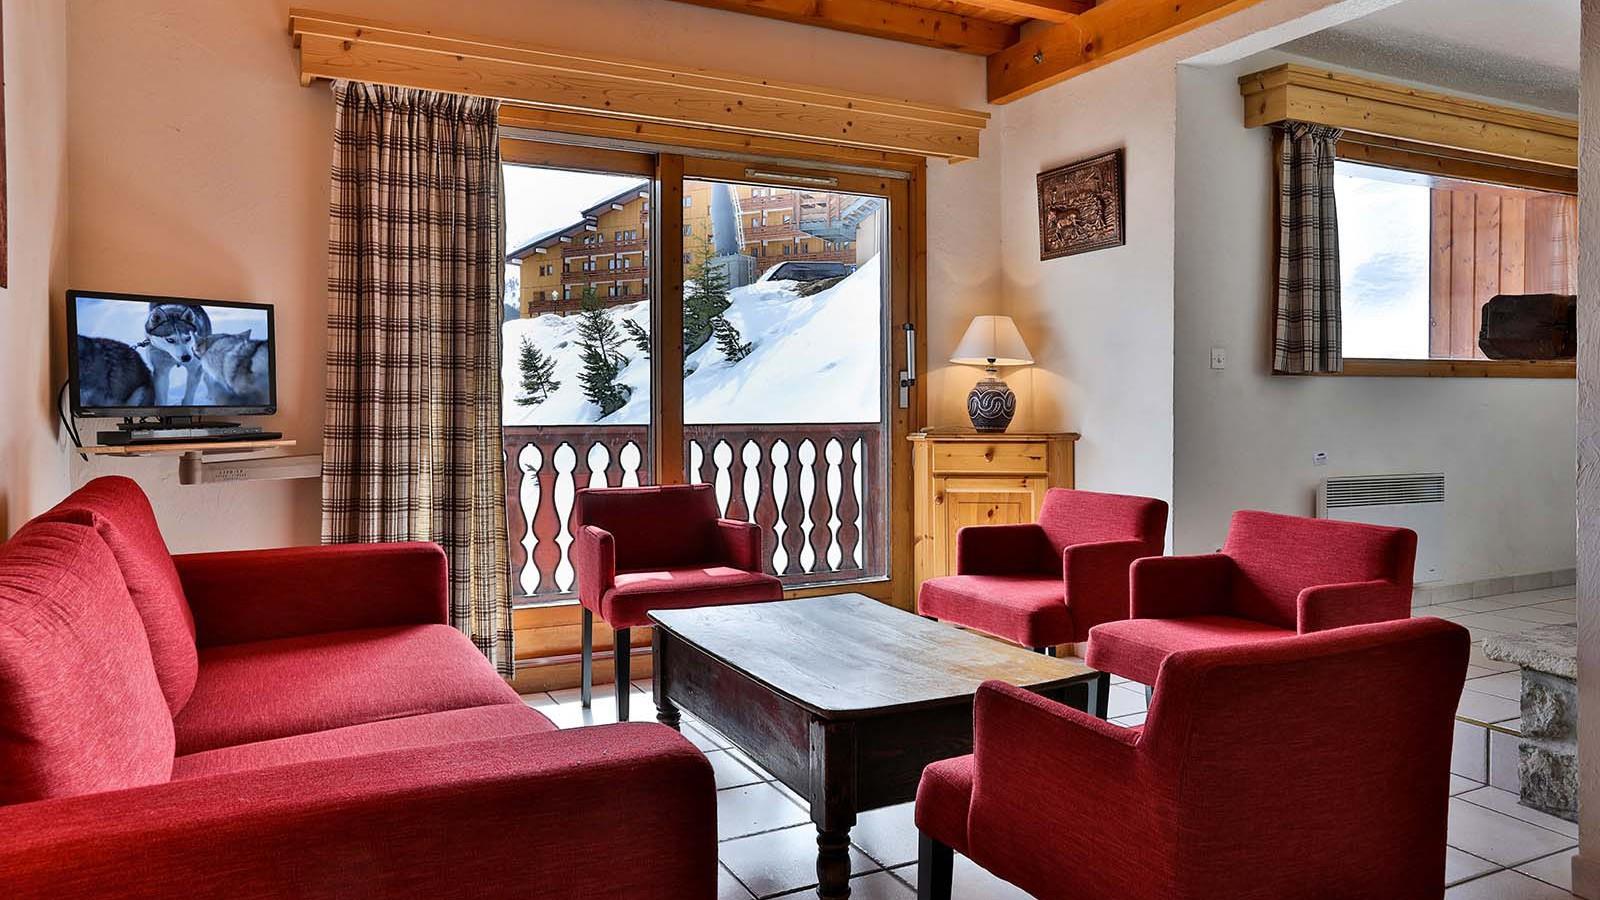 Living Area, Chalet Leopold, Meribel, France